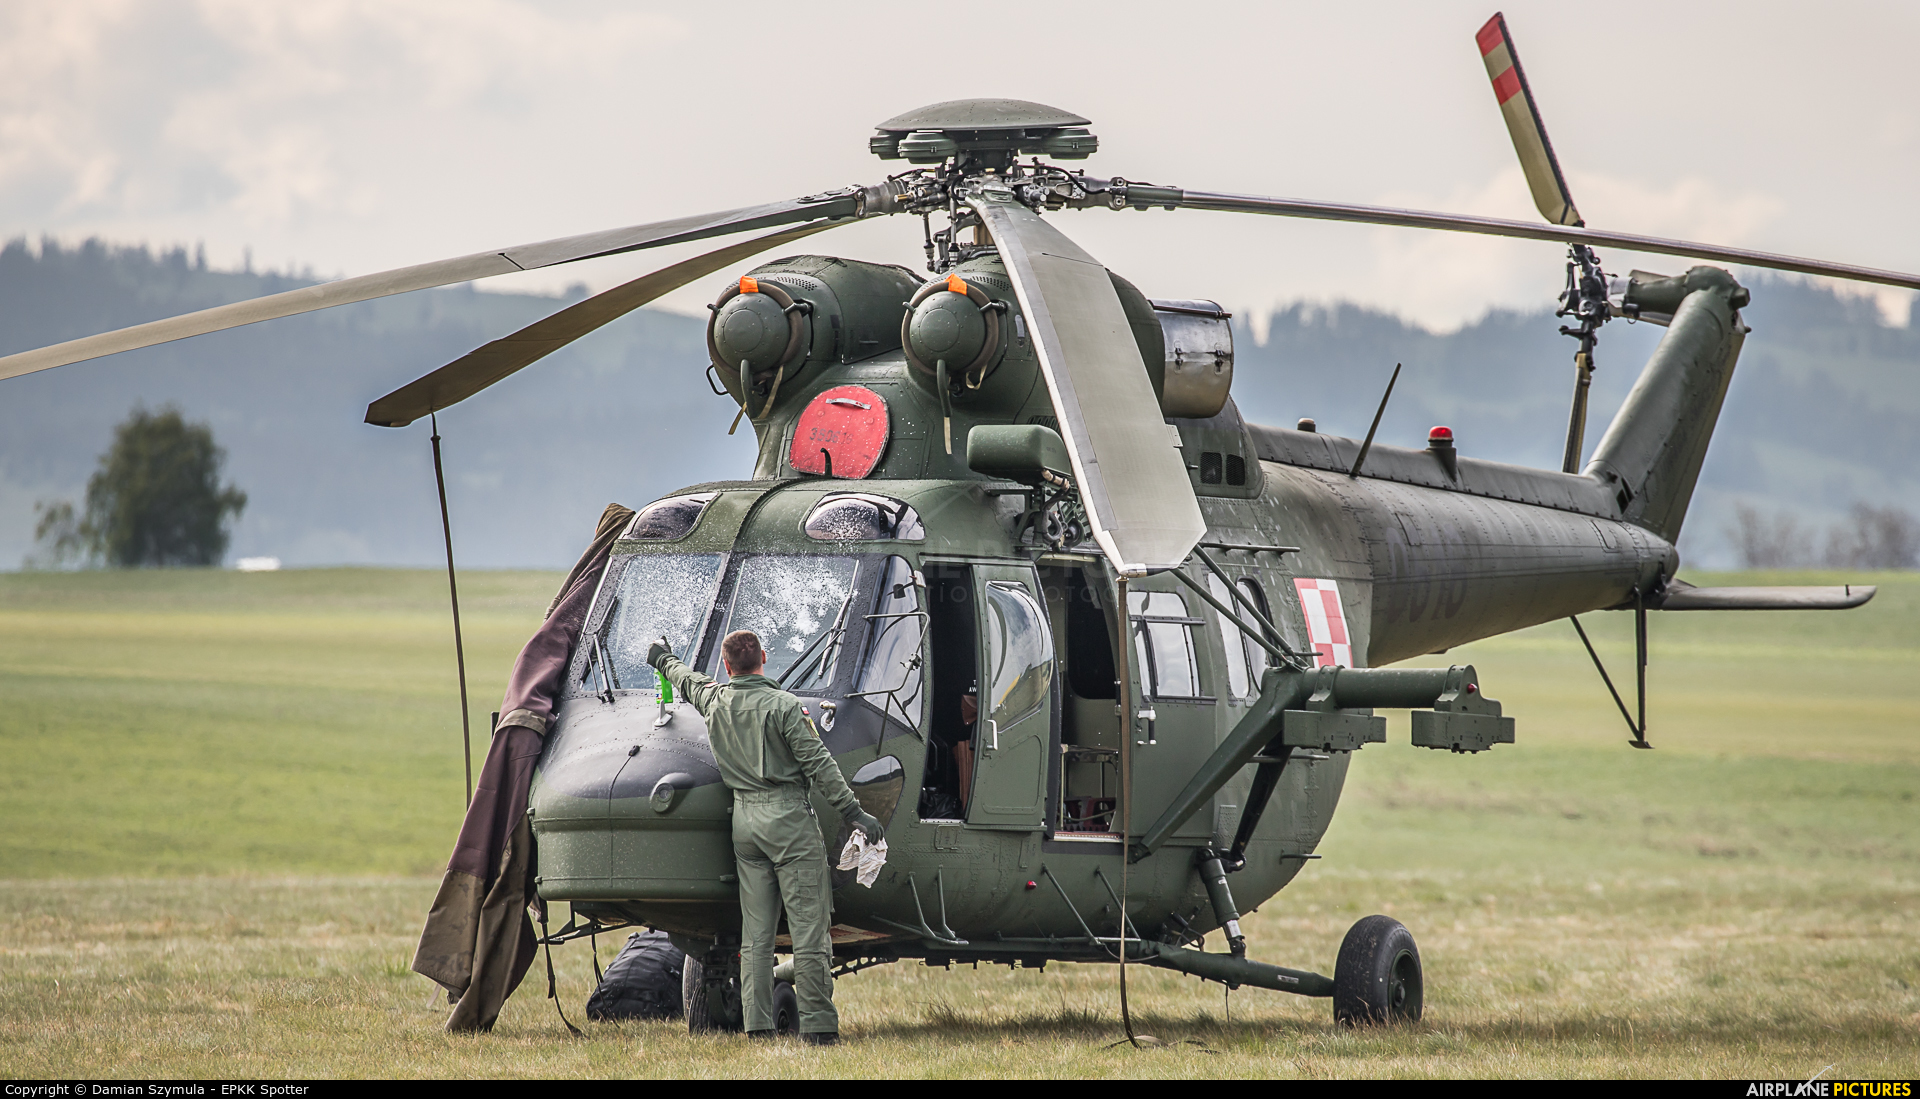 Poland - Army 0616 aircraft at Nowy Targ Airport